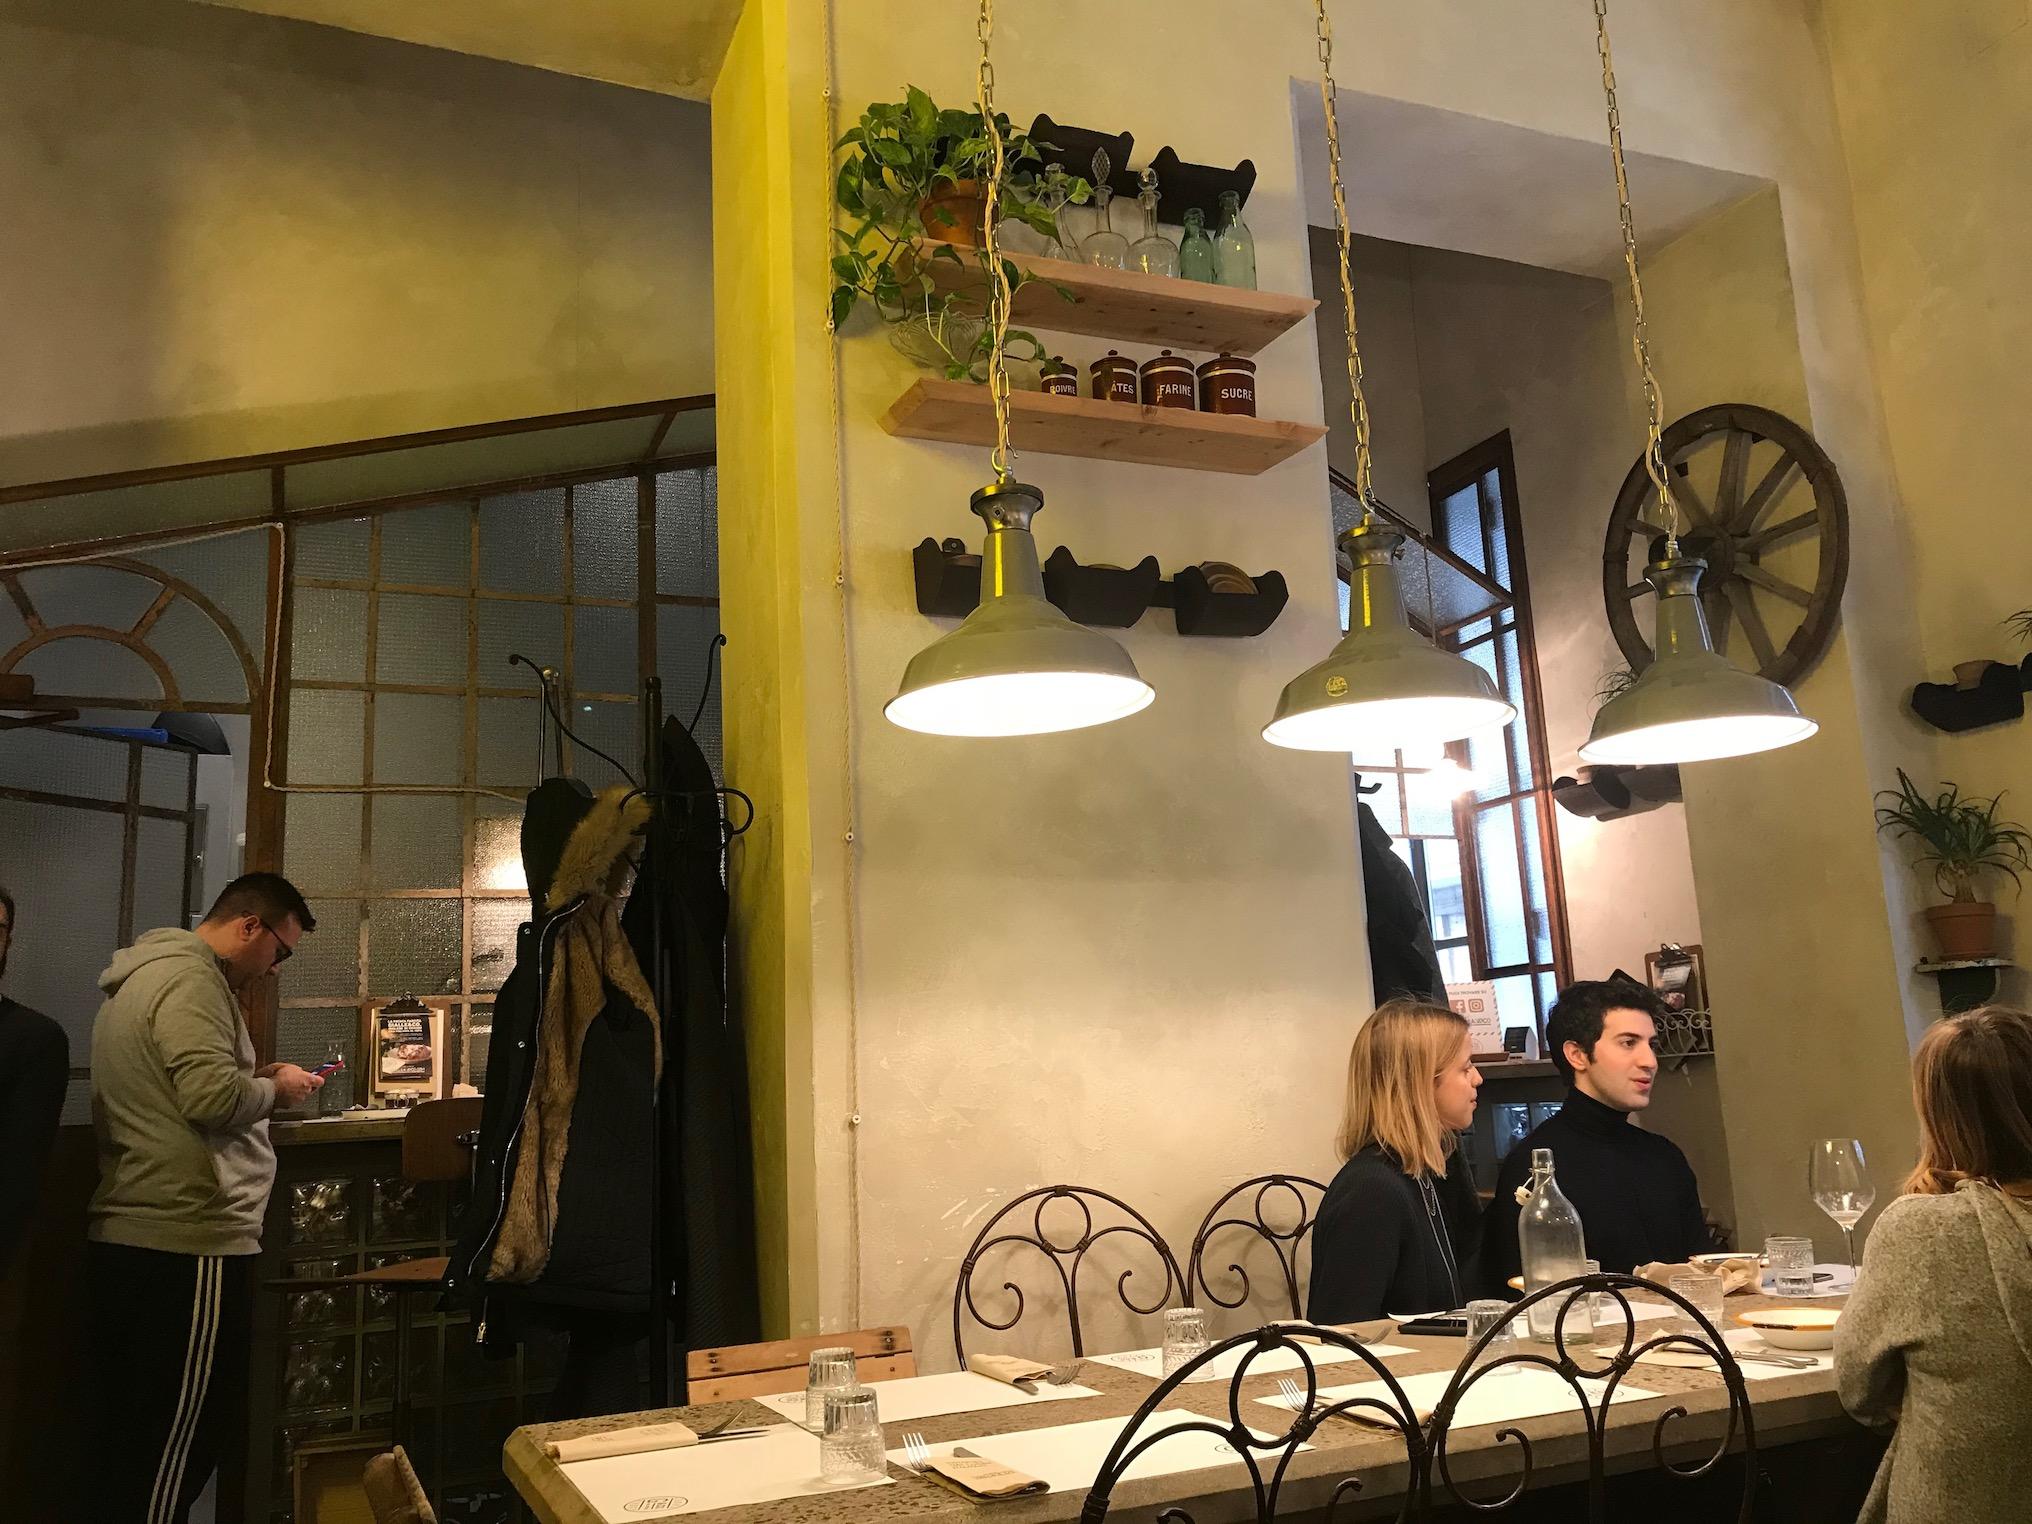 A Milano da Gialle&Co le baked potatoes all'italiana in tante versioni, anche finger food